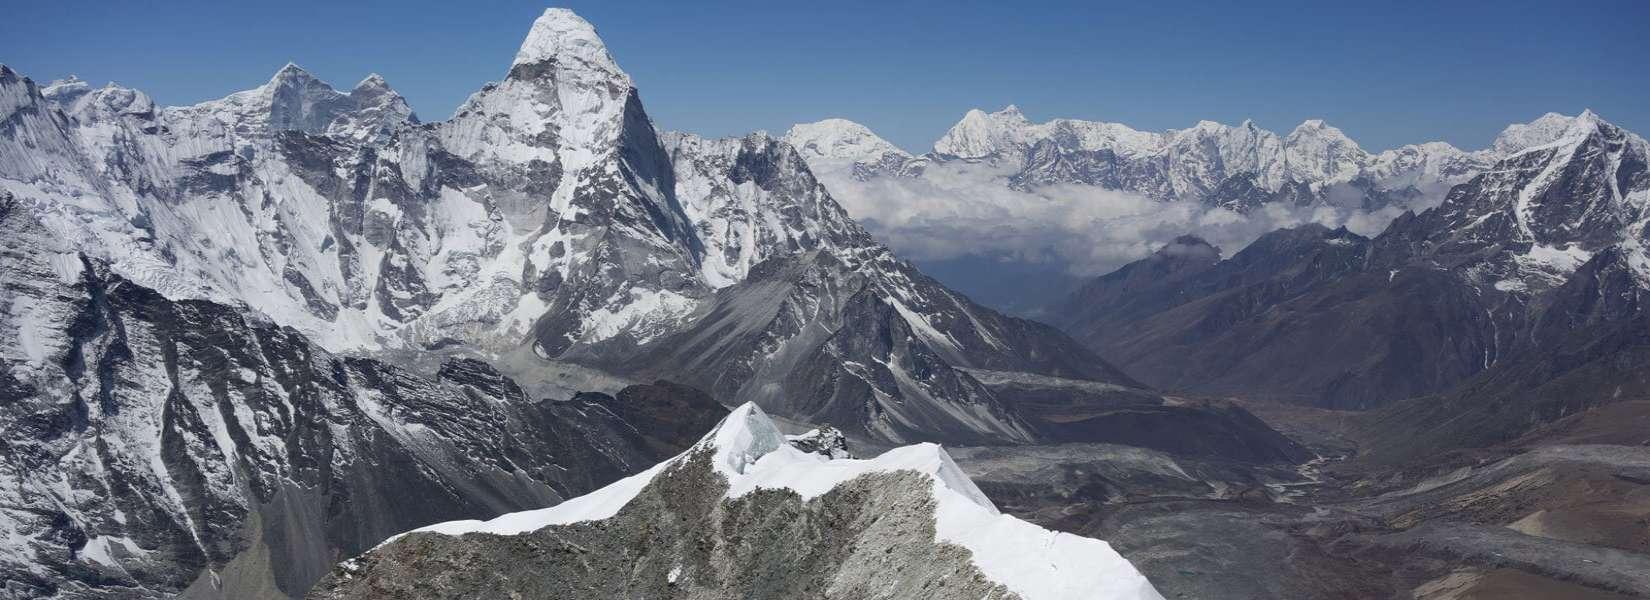 view of neighboring mountain from island peak